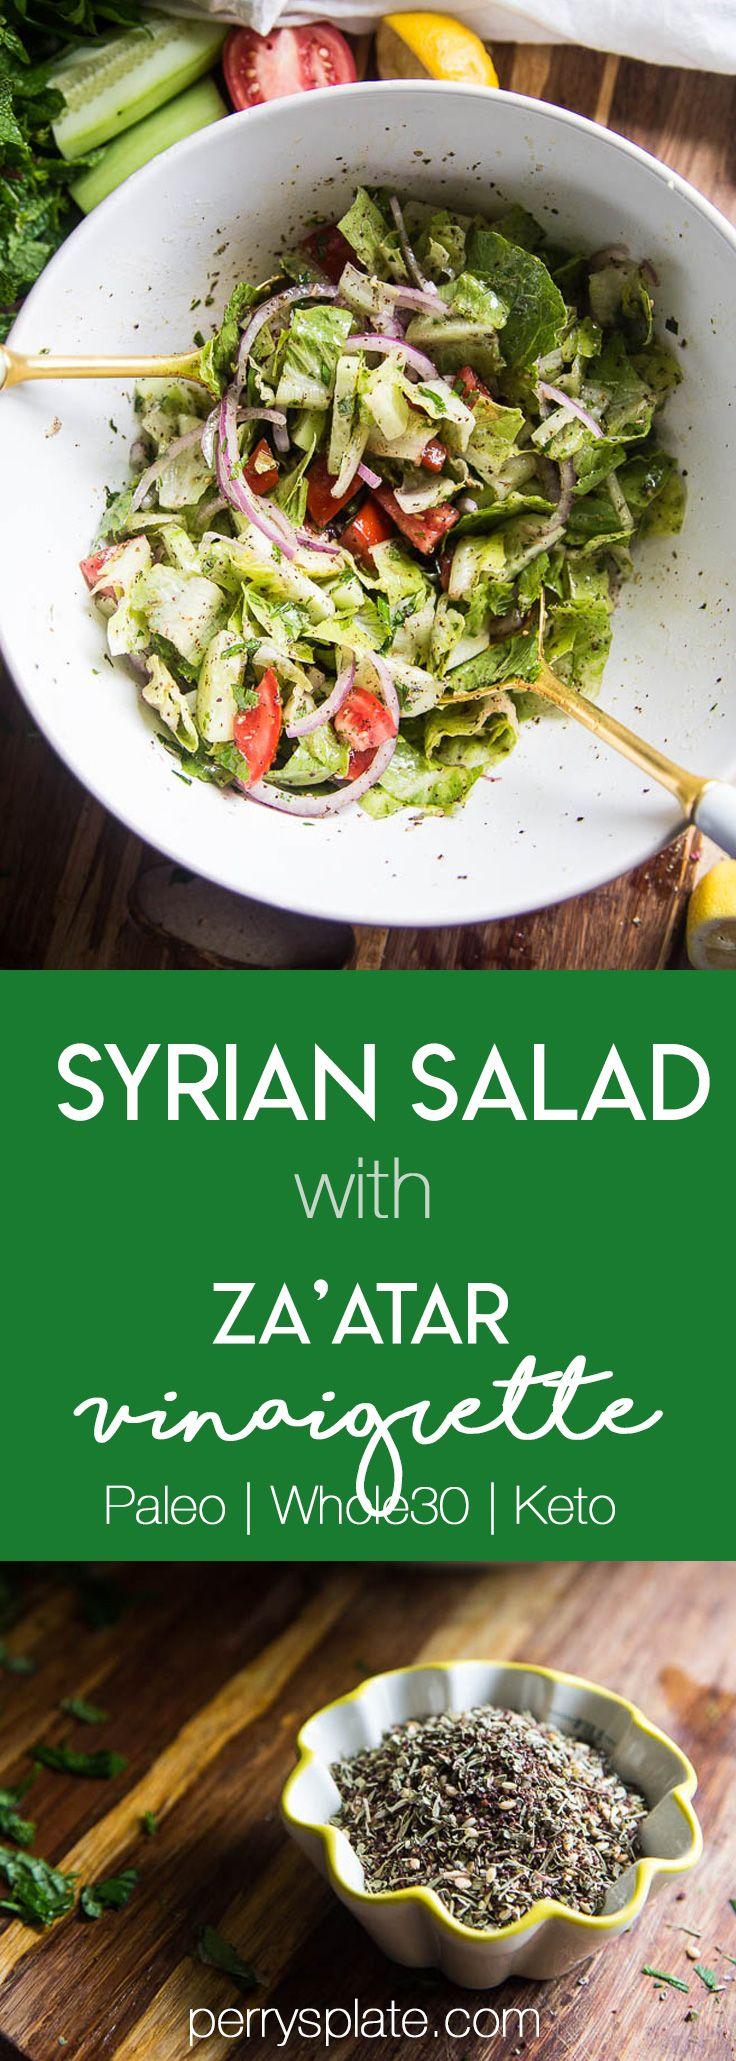 Syrian Salad with Za'atar Vinaigrette   Food from Our Ancestors   paleo recipes   Whole30 recipes   salad recipes   perrysplate.com